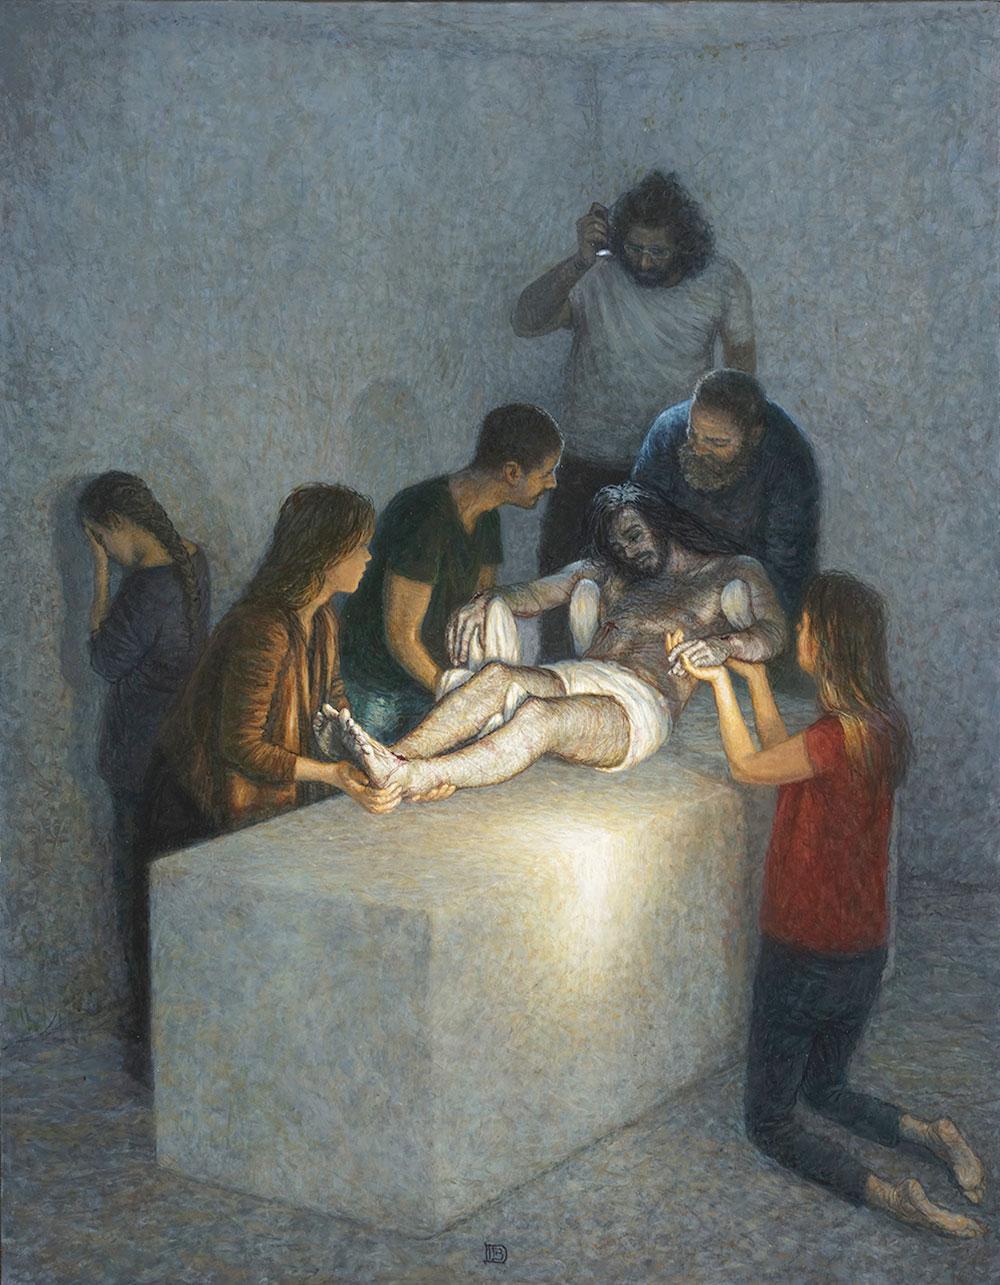 Peinture - JÉSUS EST MIS AU TOMBEAU